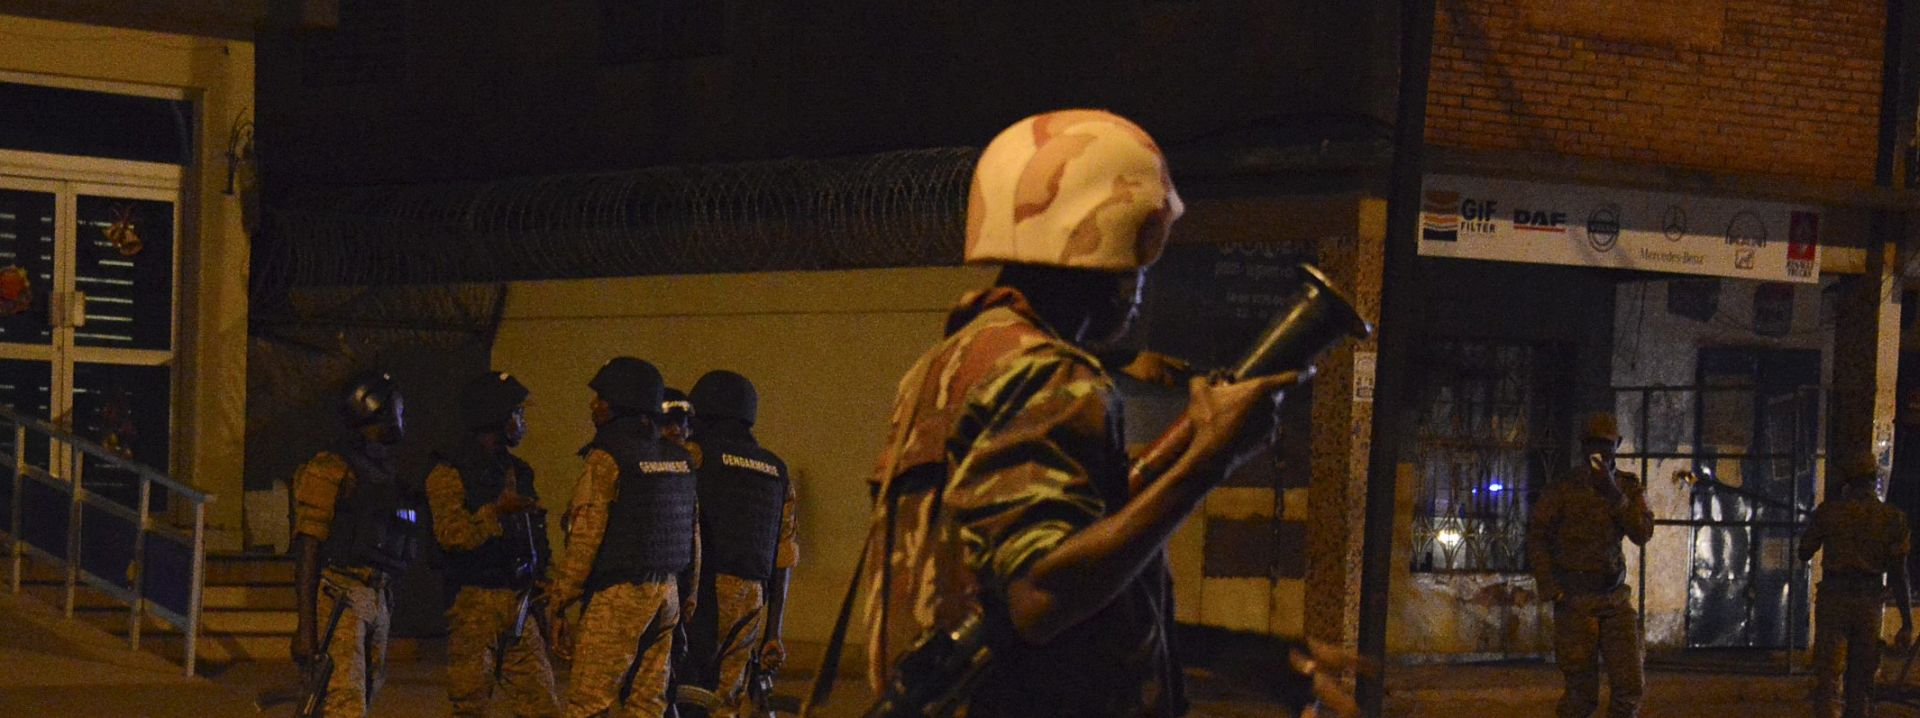 BURKINA FASO Osumnjičeni džihadisiti u napadu na restoran ubili 17-ero, ranili osmero ljudi